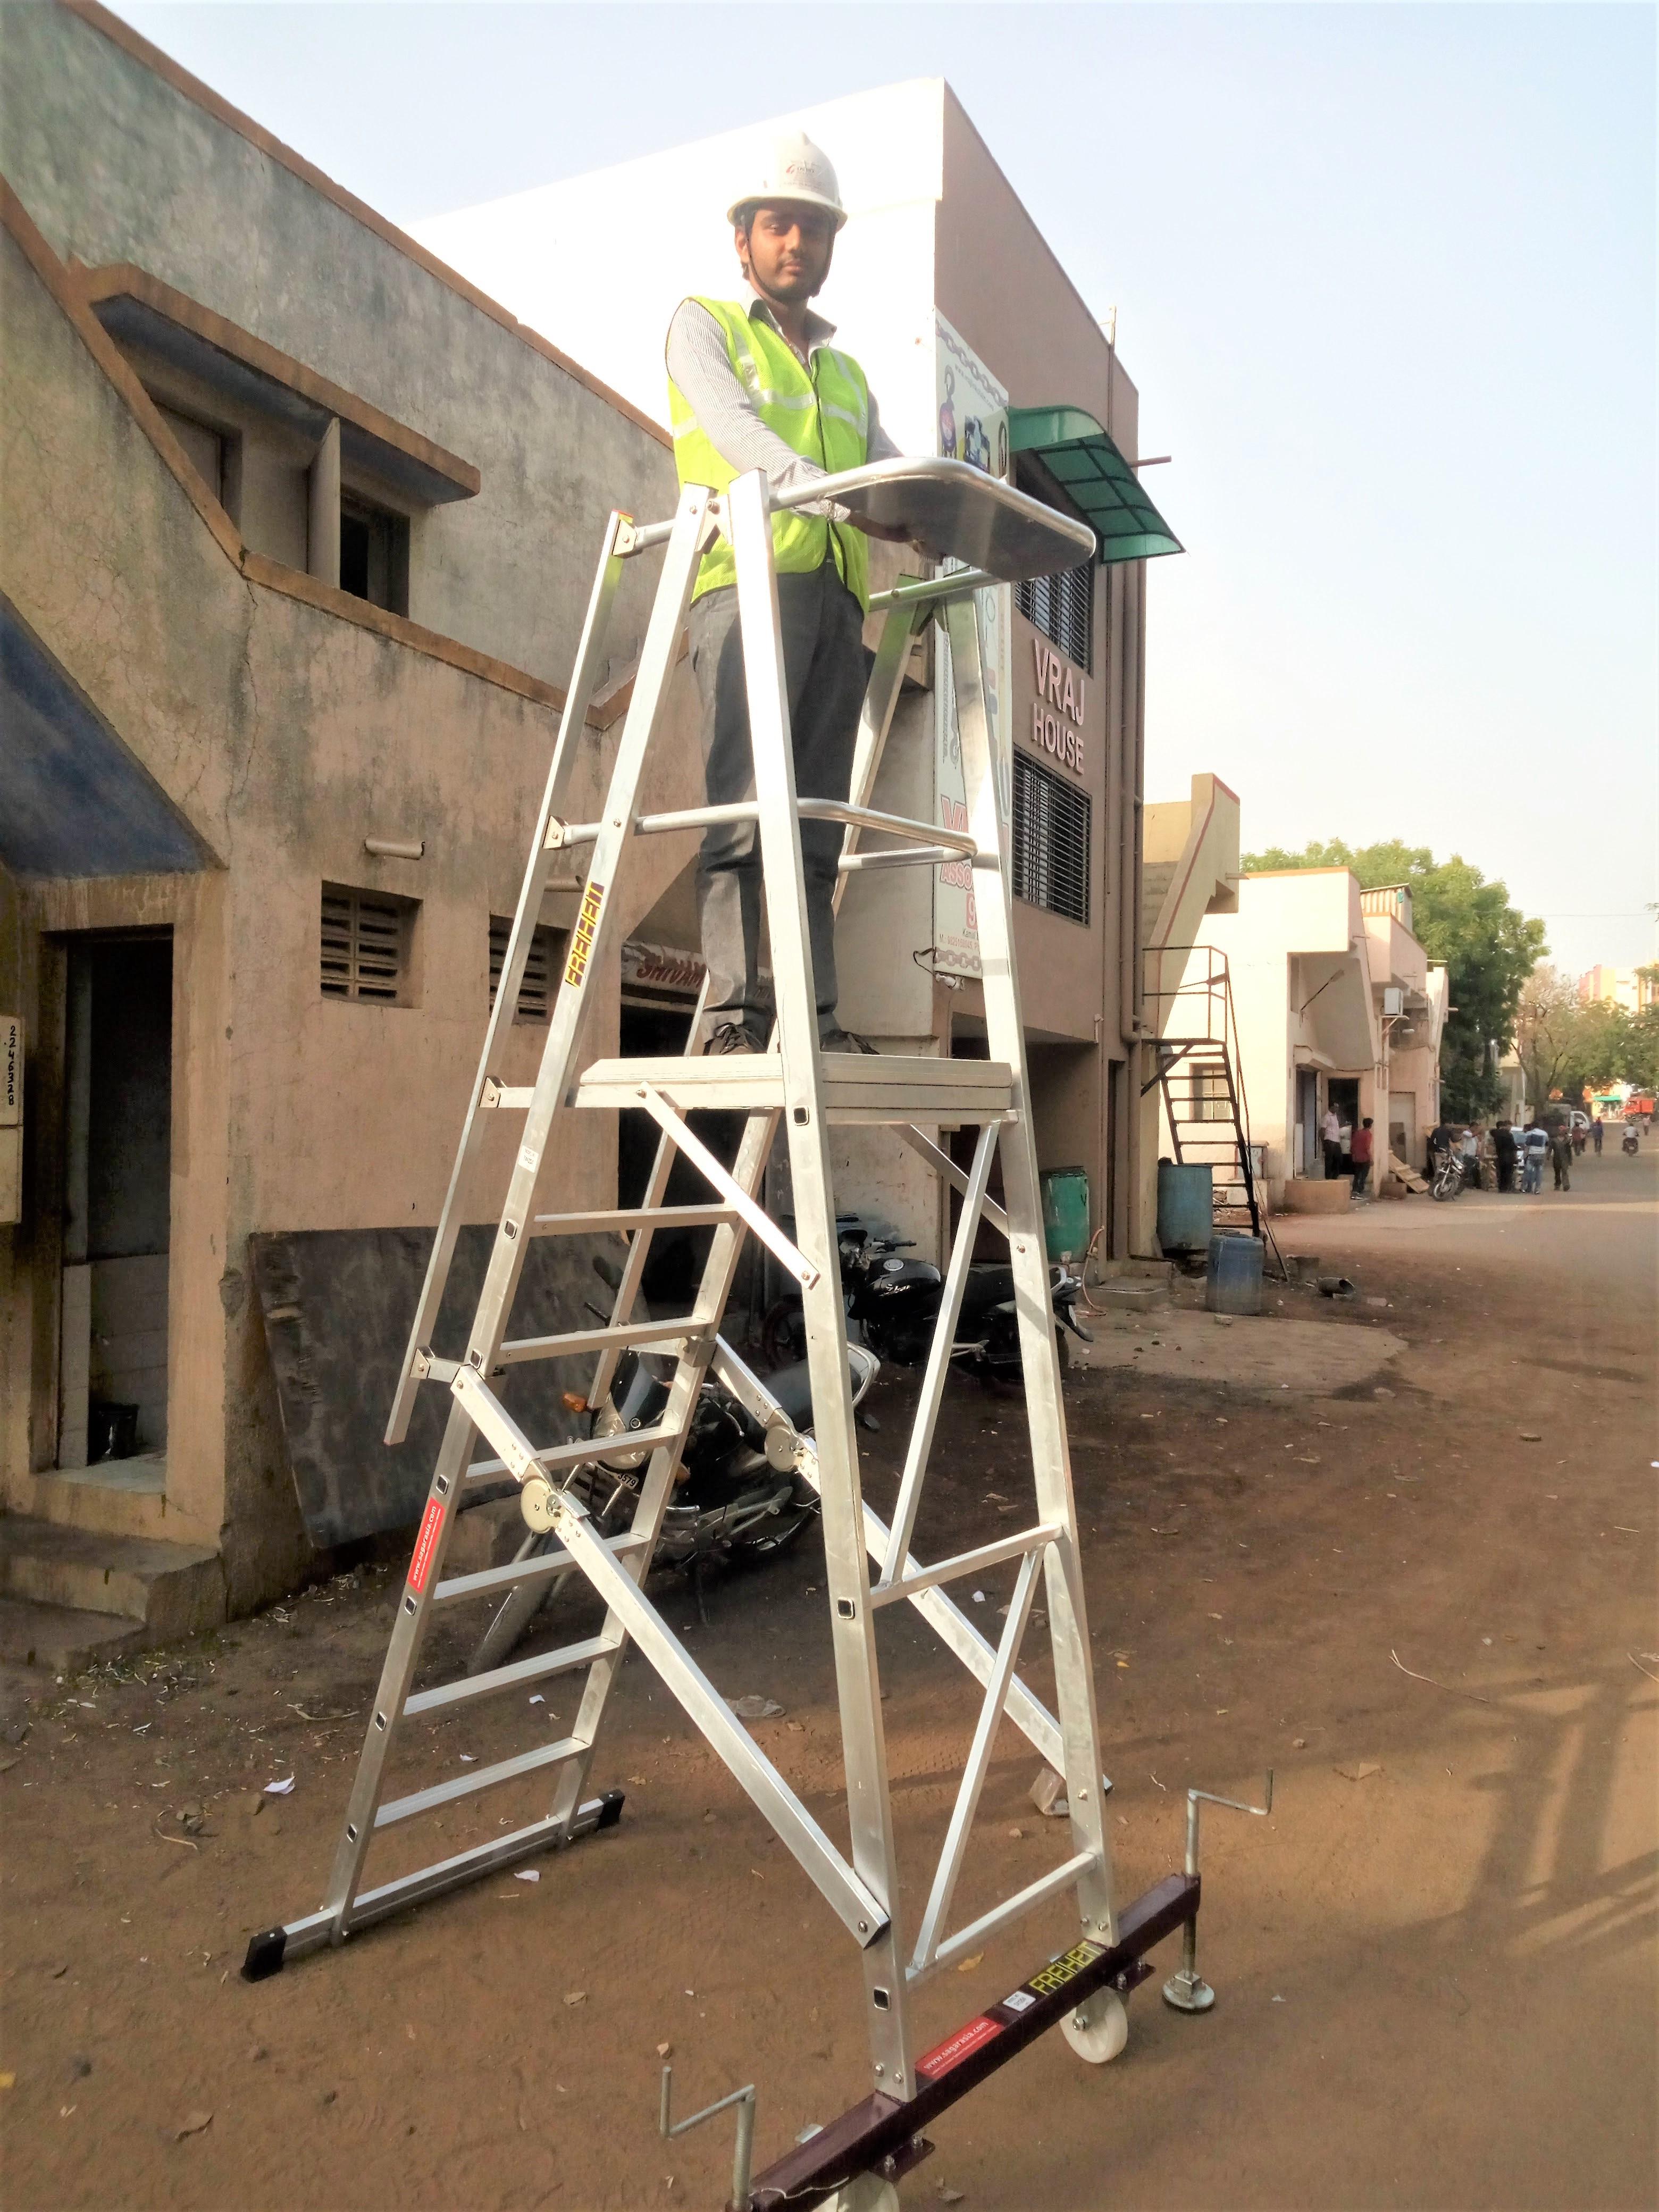 Folding platform ladder (Stocker_s Ladder)